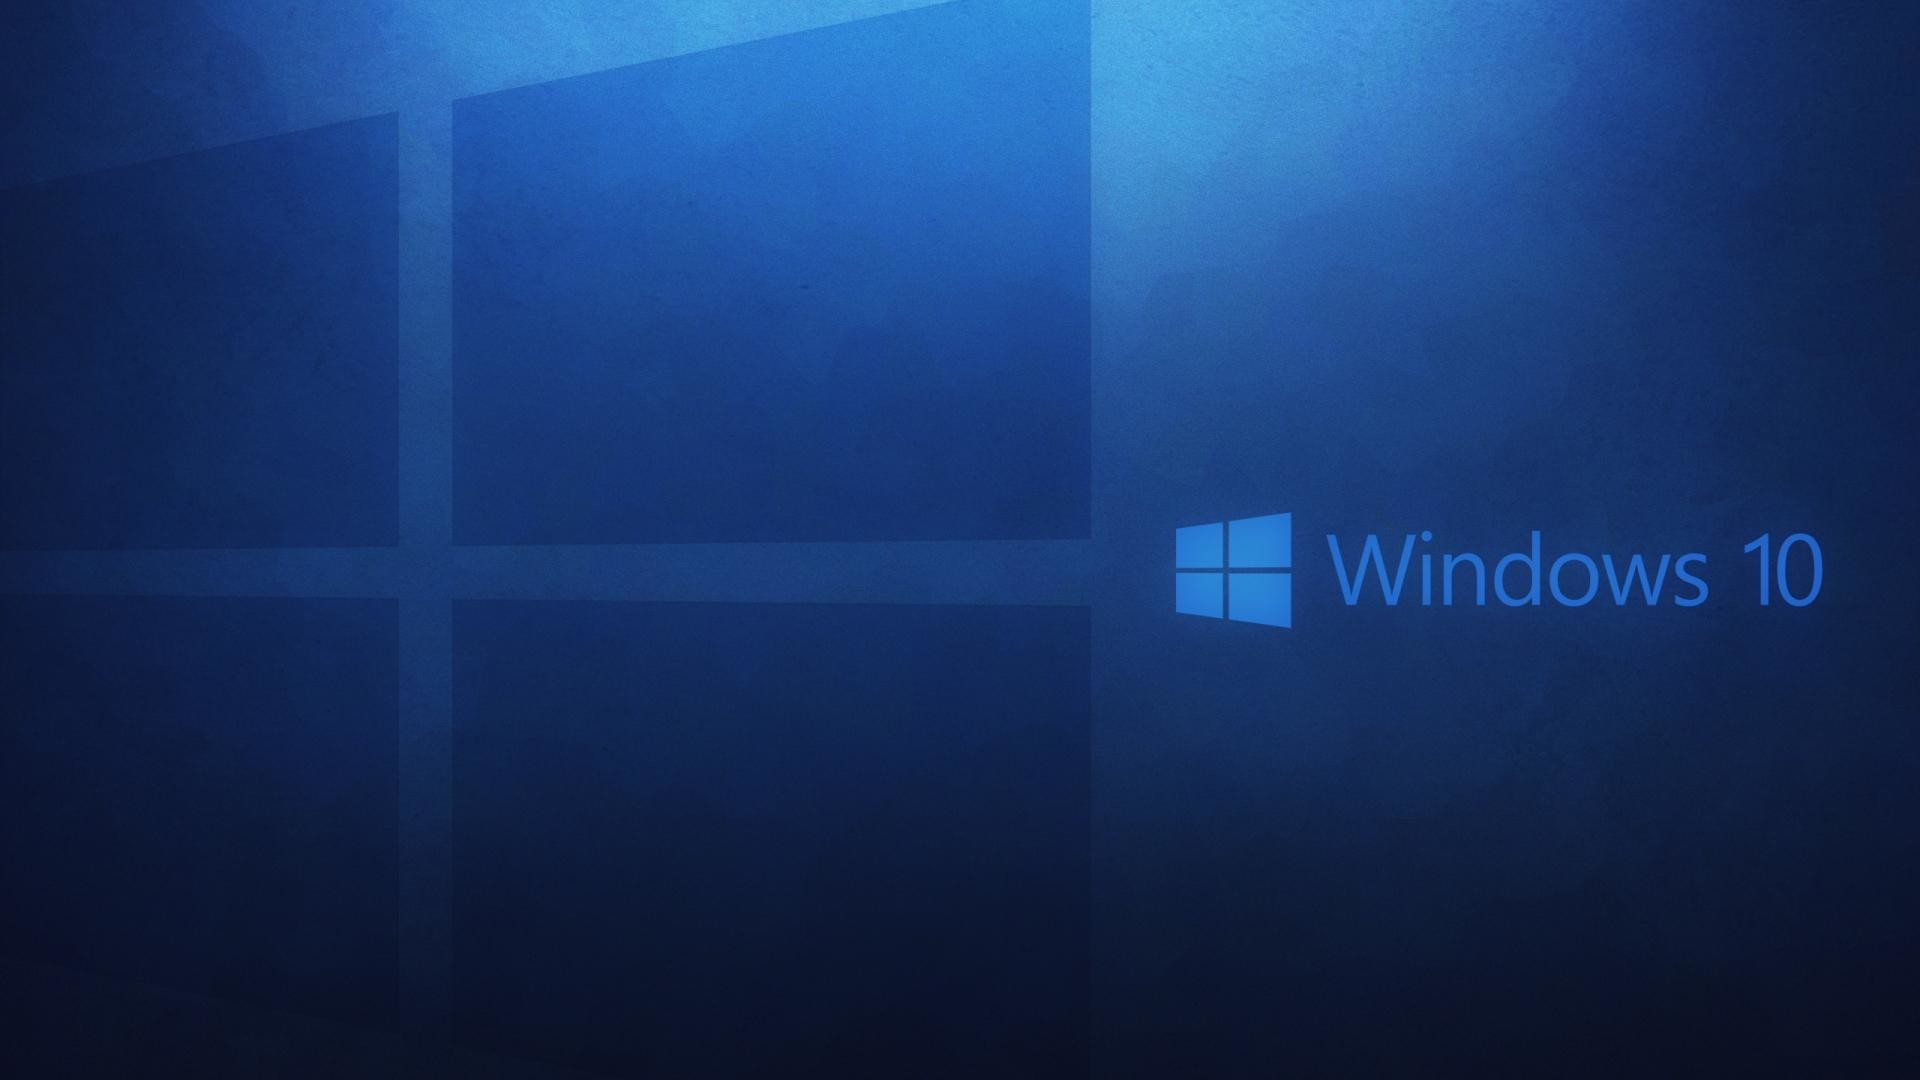 Windows-10-Microsoft-OS-Operating-System-Blue-Shadow-Logo-Text